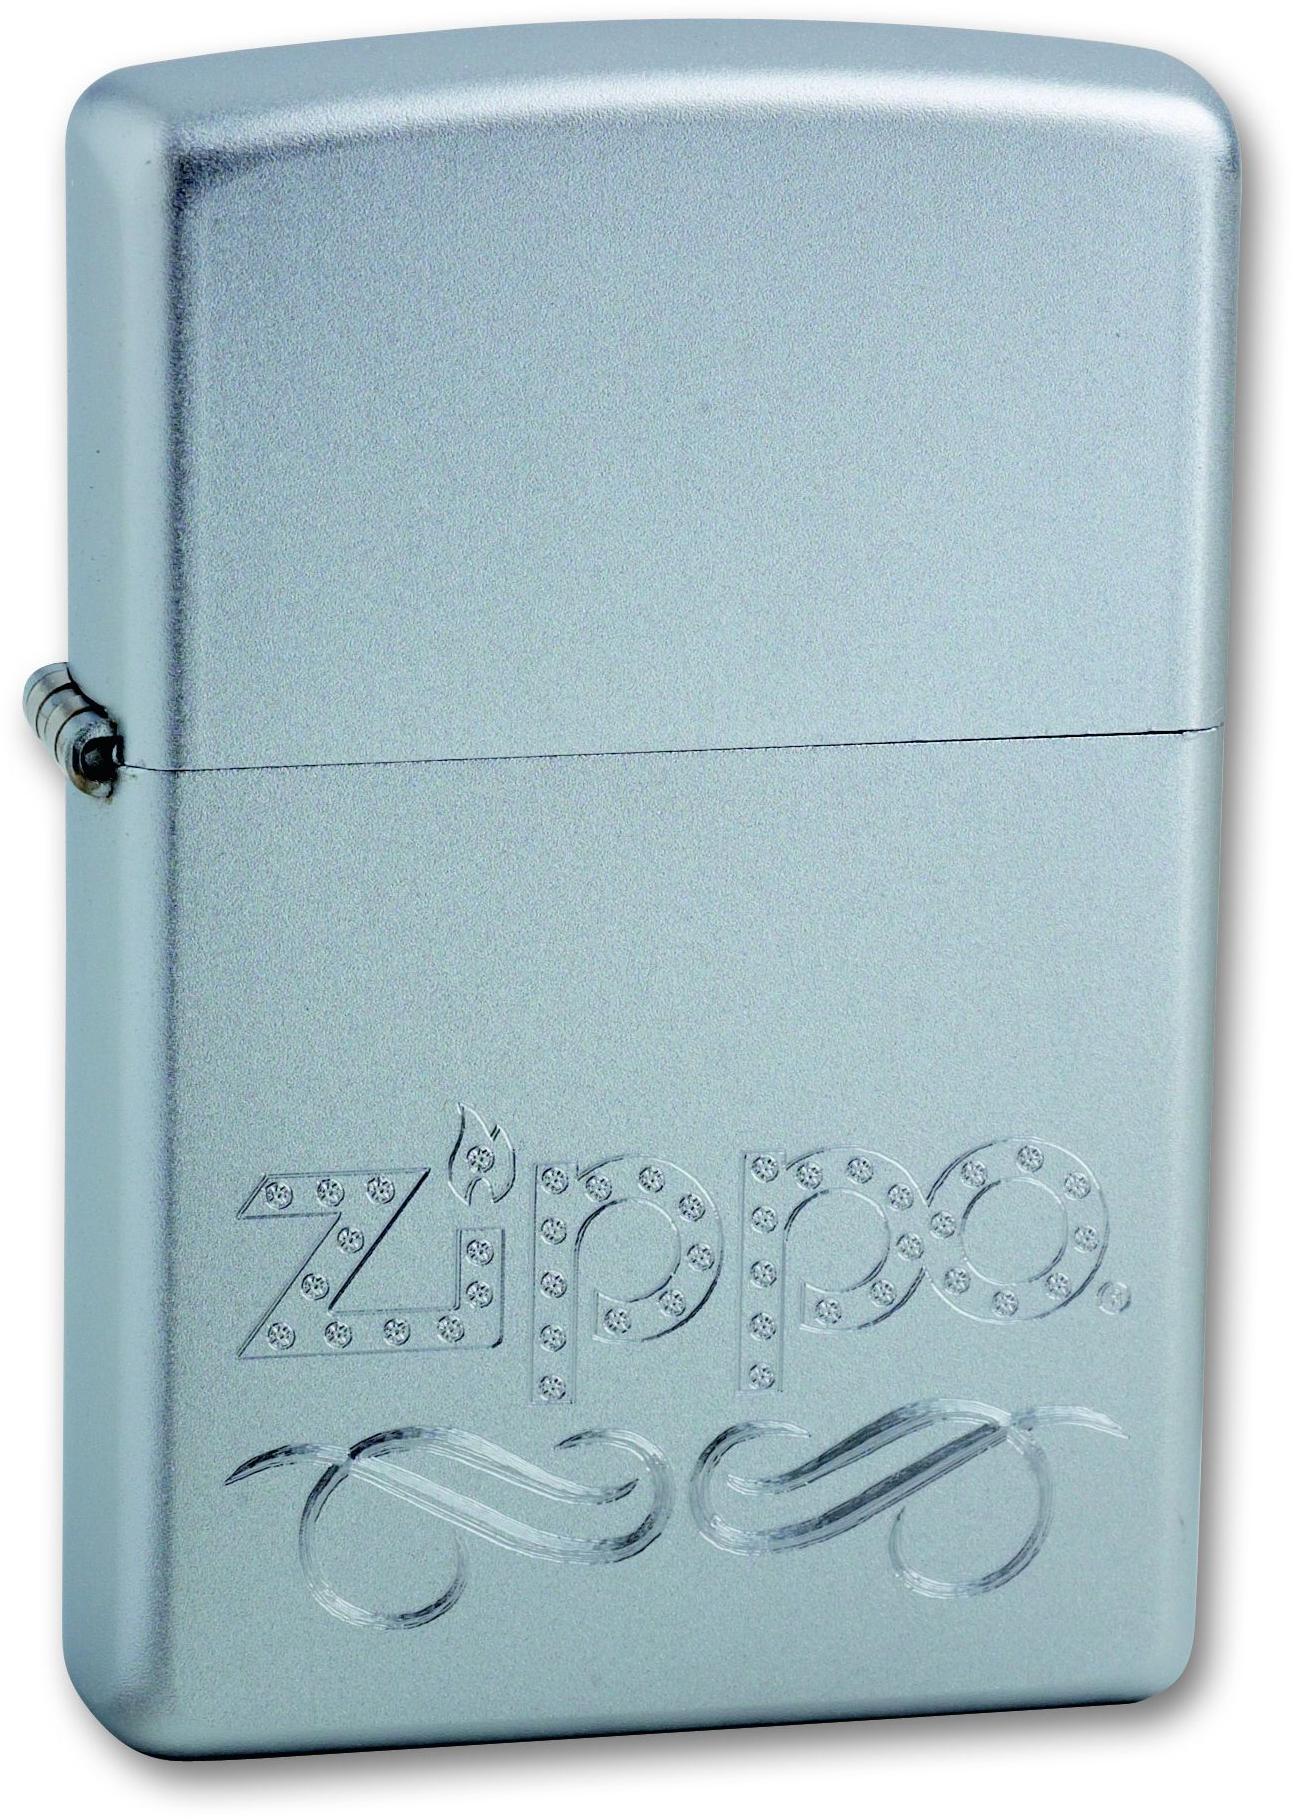 купить Зажигалка ZIPPO Zippo Scroll Satin Chrome, латунь с ник.-хром. покрыт., серебр., матовая, 36х56х12 мм дешево